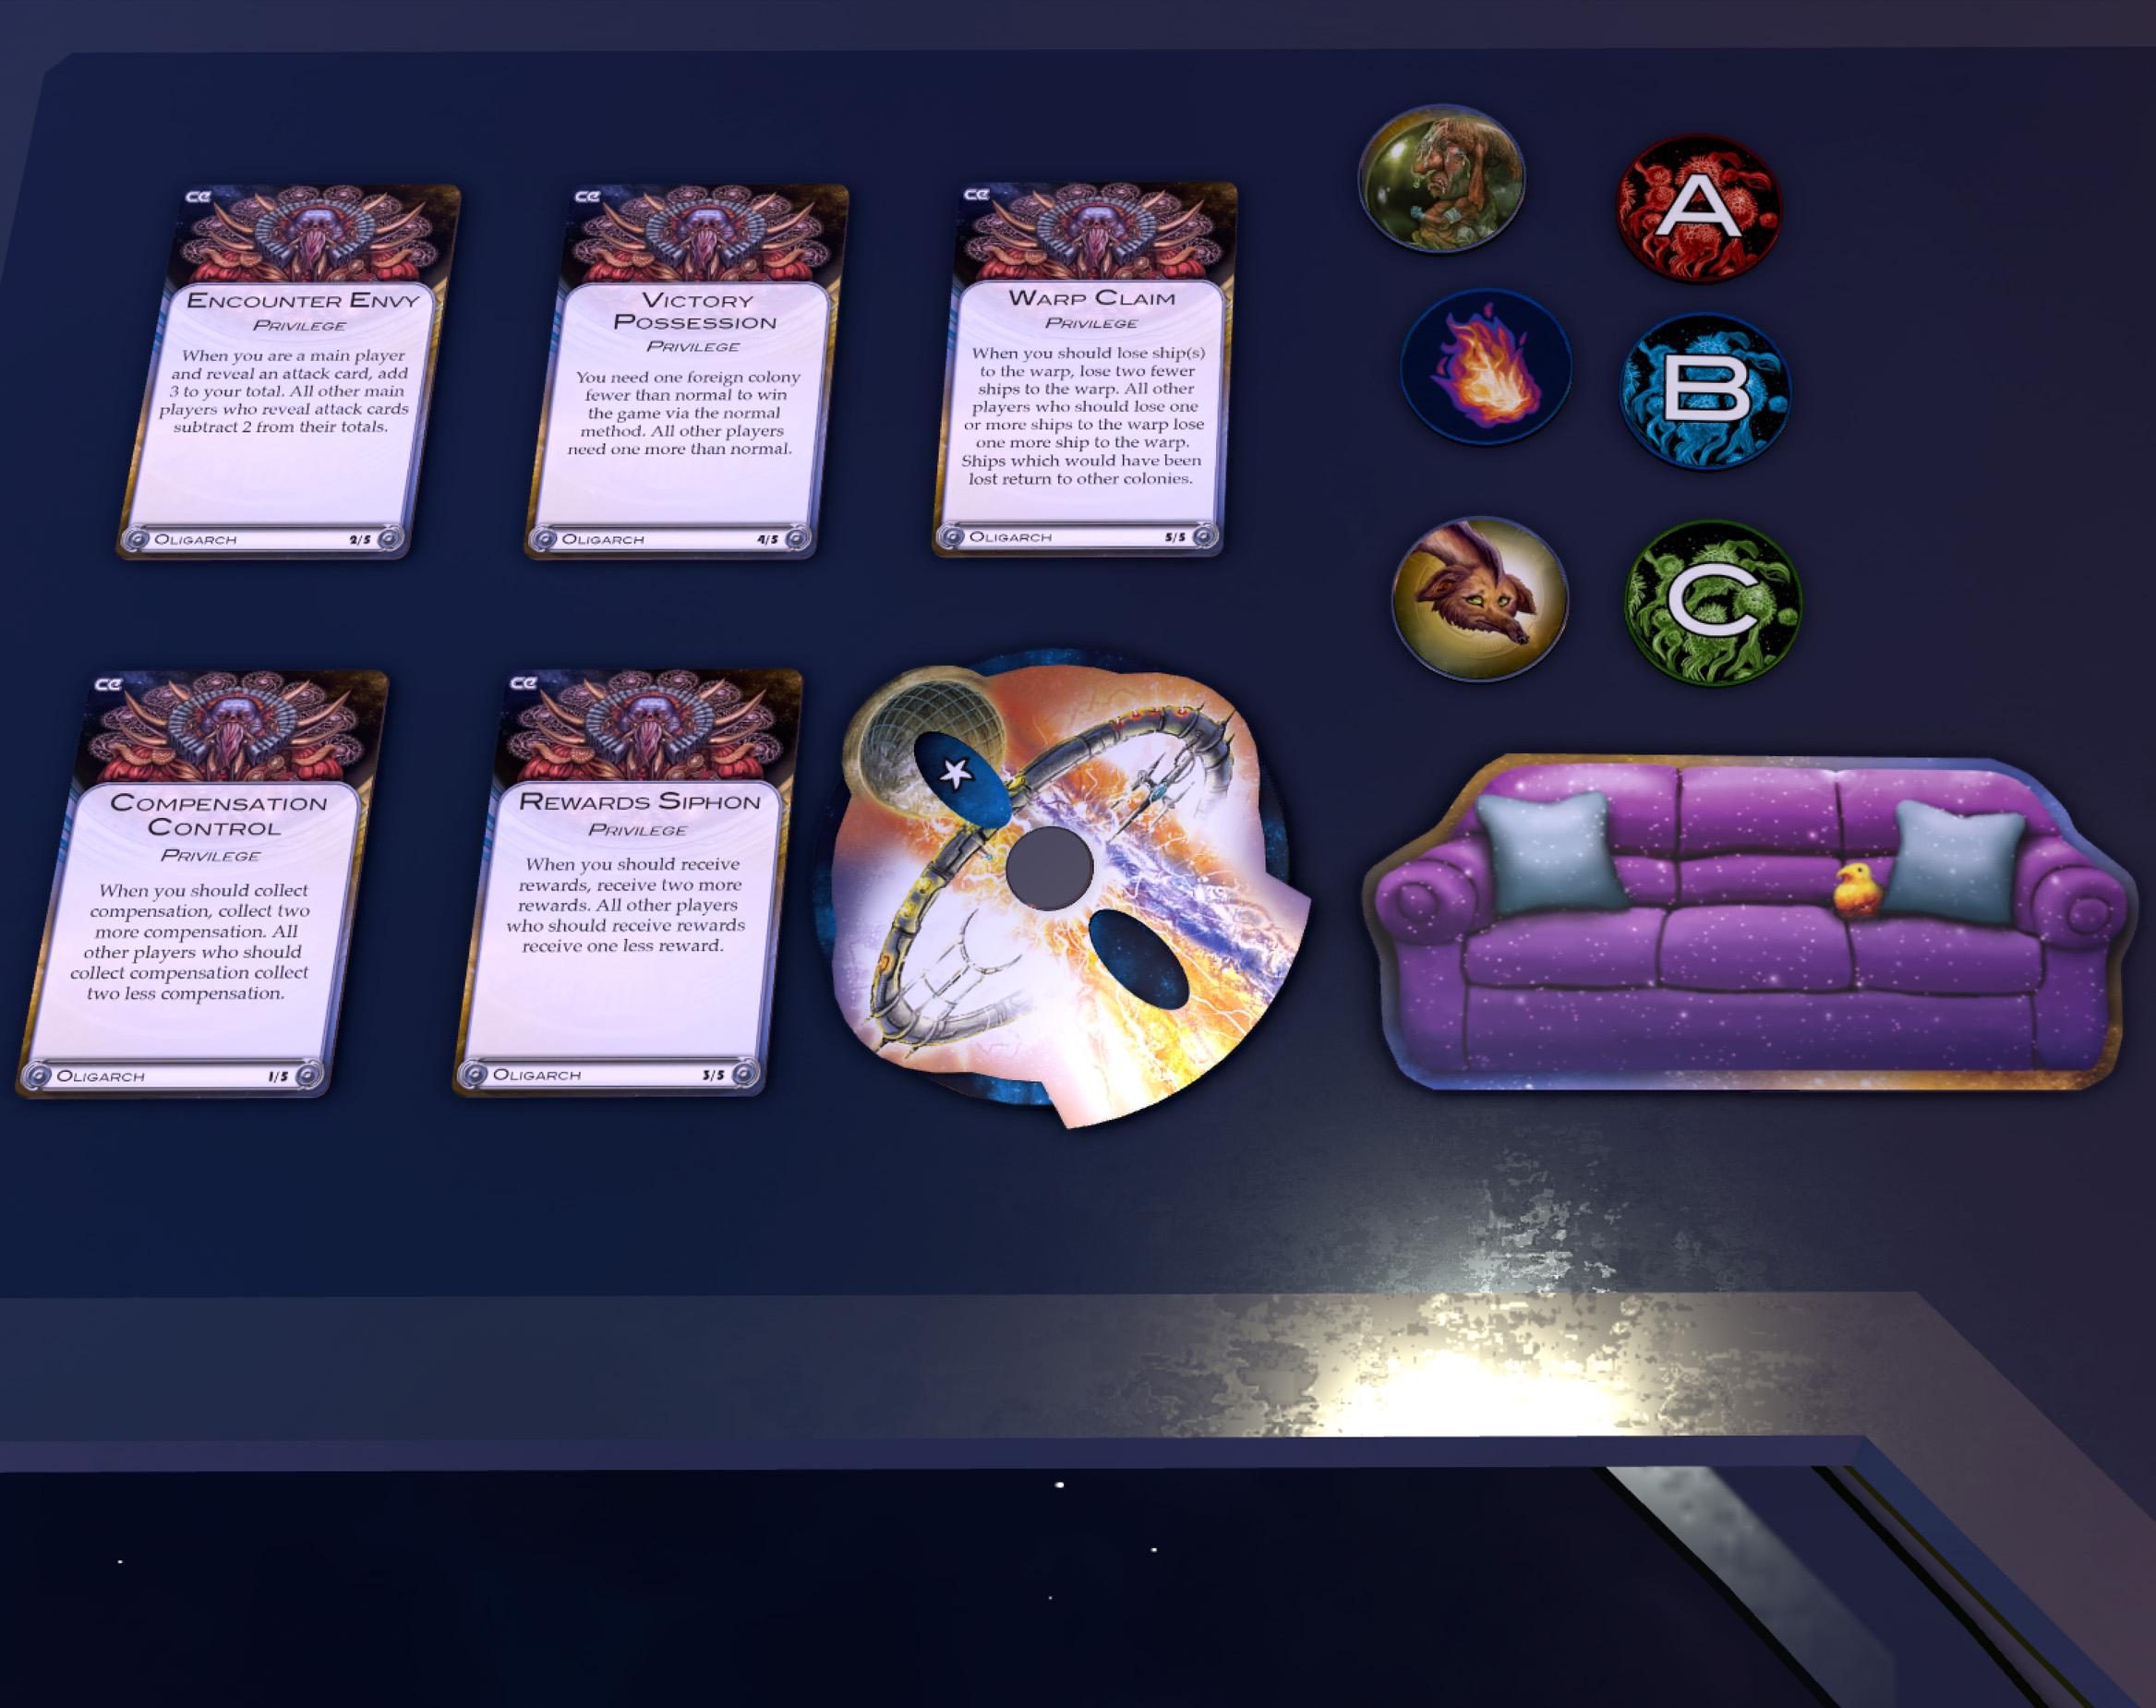 playnow-gamesetup5.jpg